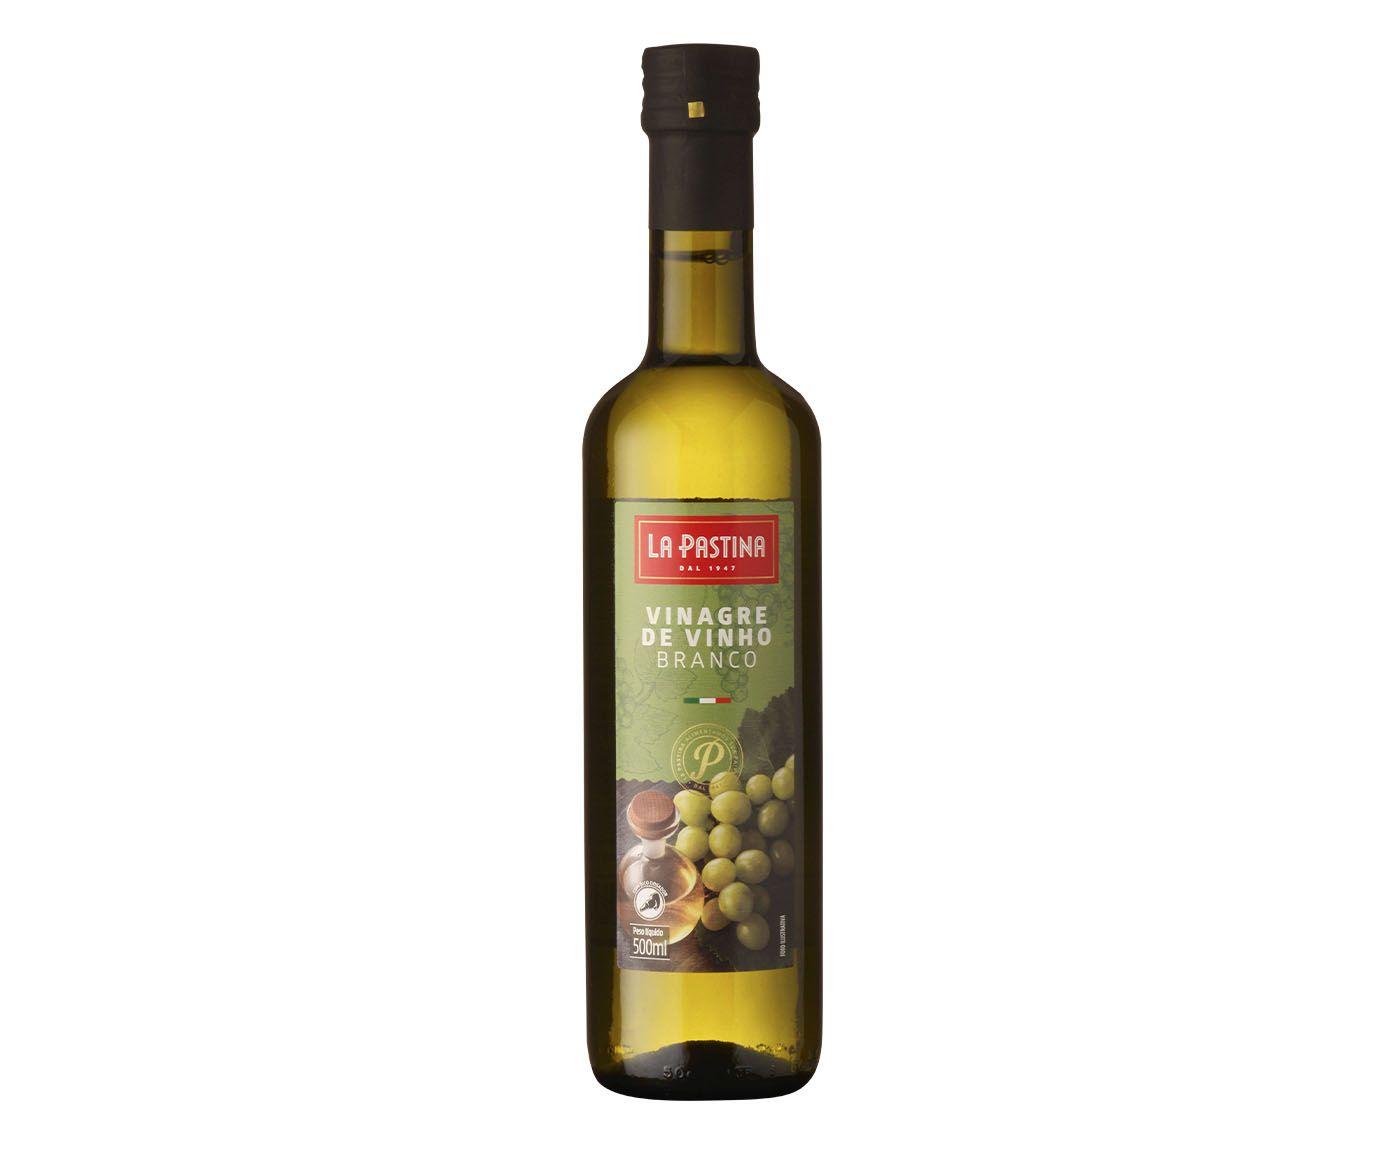 Vinagre de Vinho Branco La Pastina - 500ml | Westwing.com.br